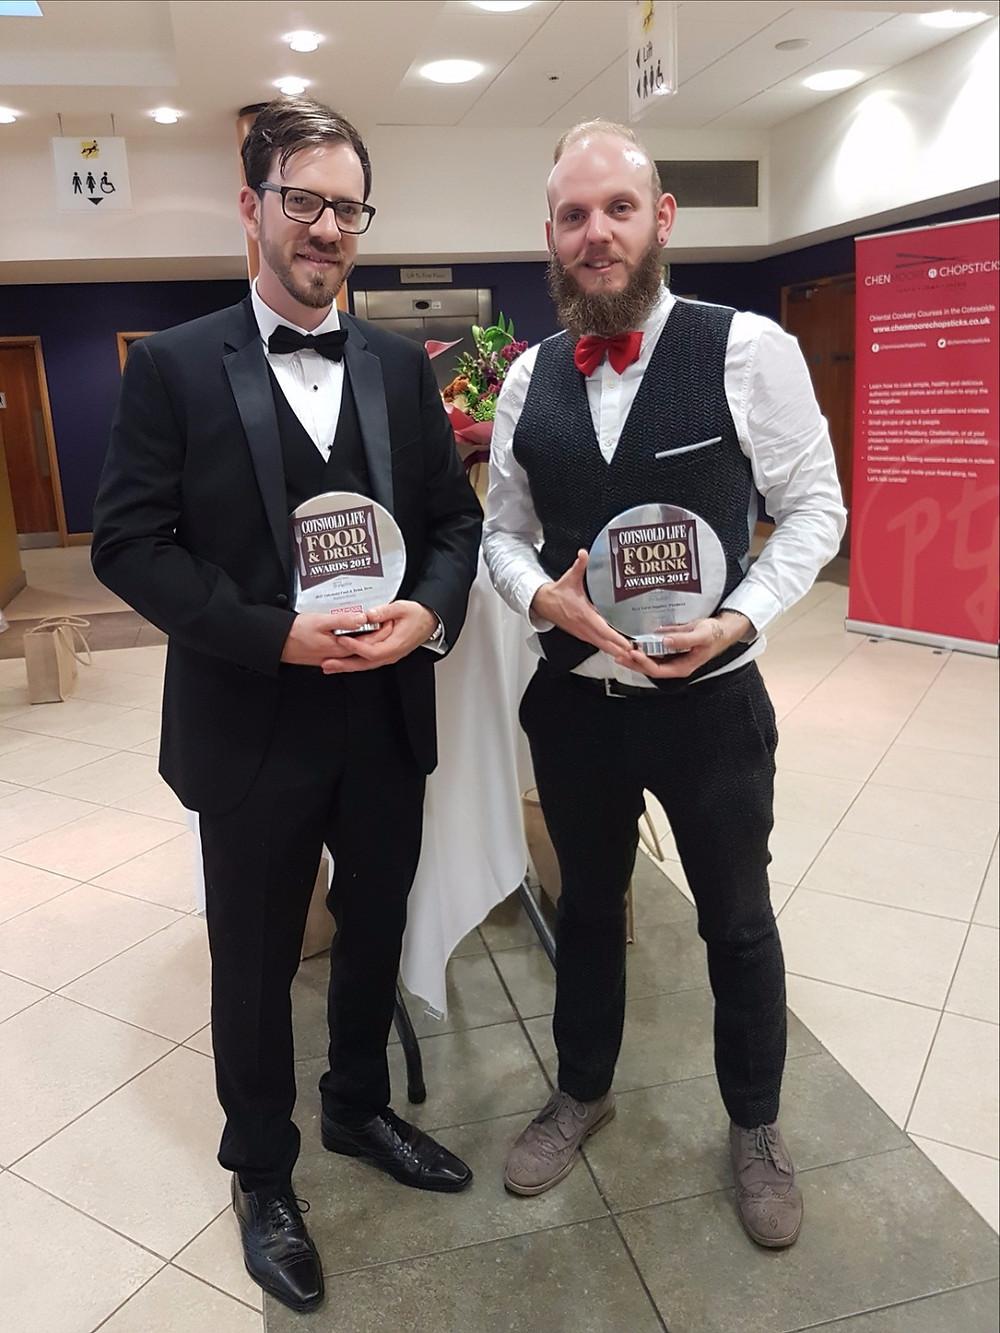 James Moinet (left) & James Horwood (right)